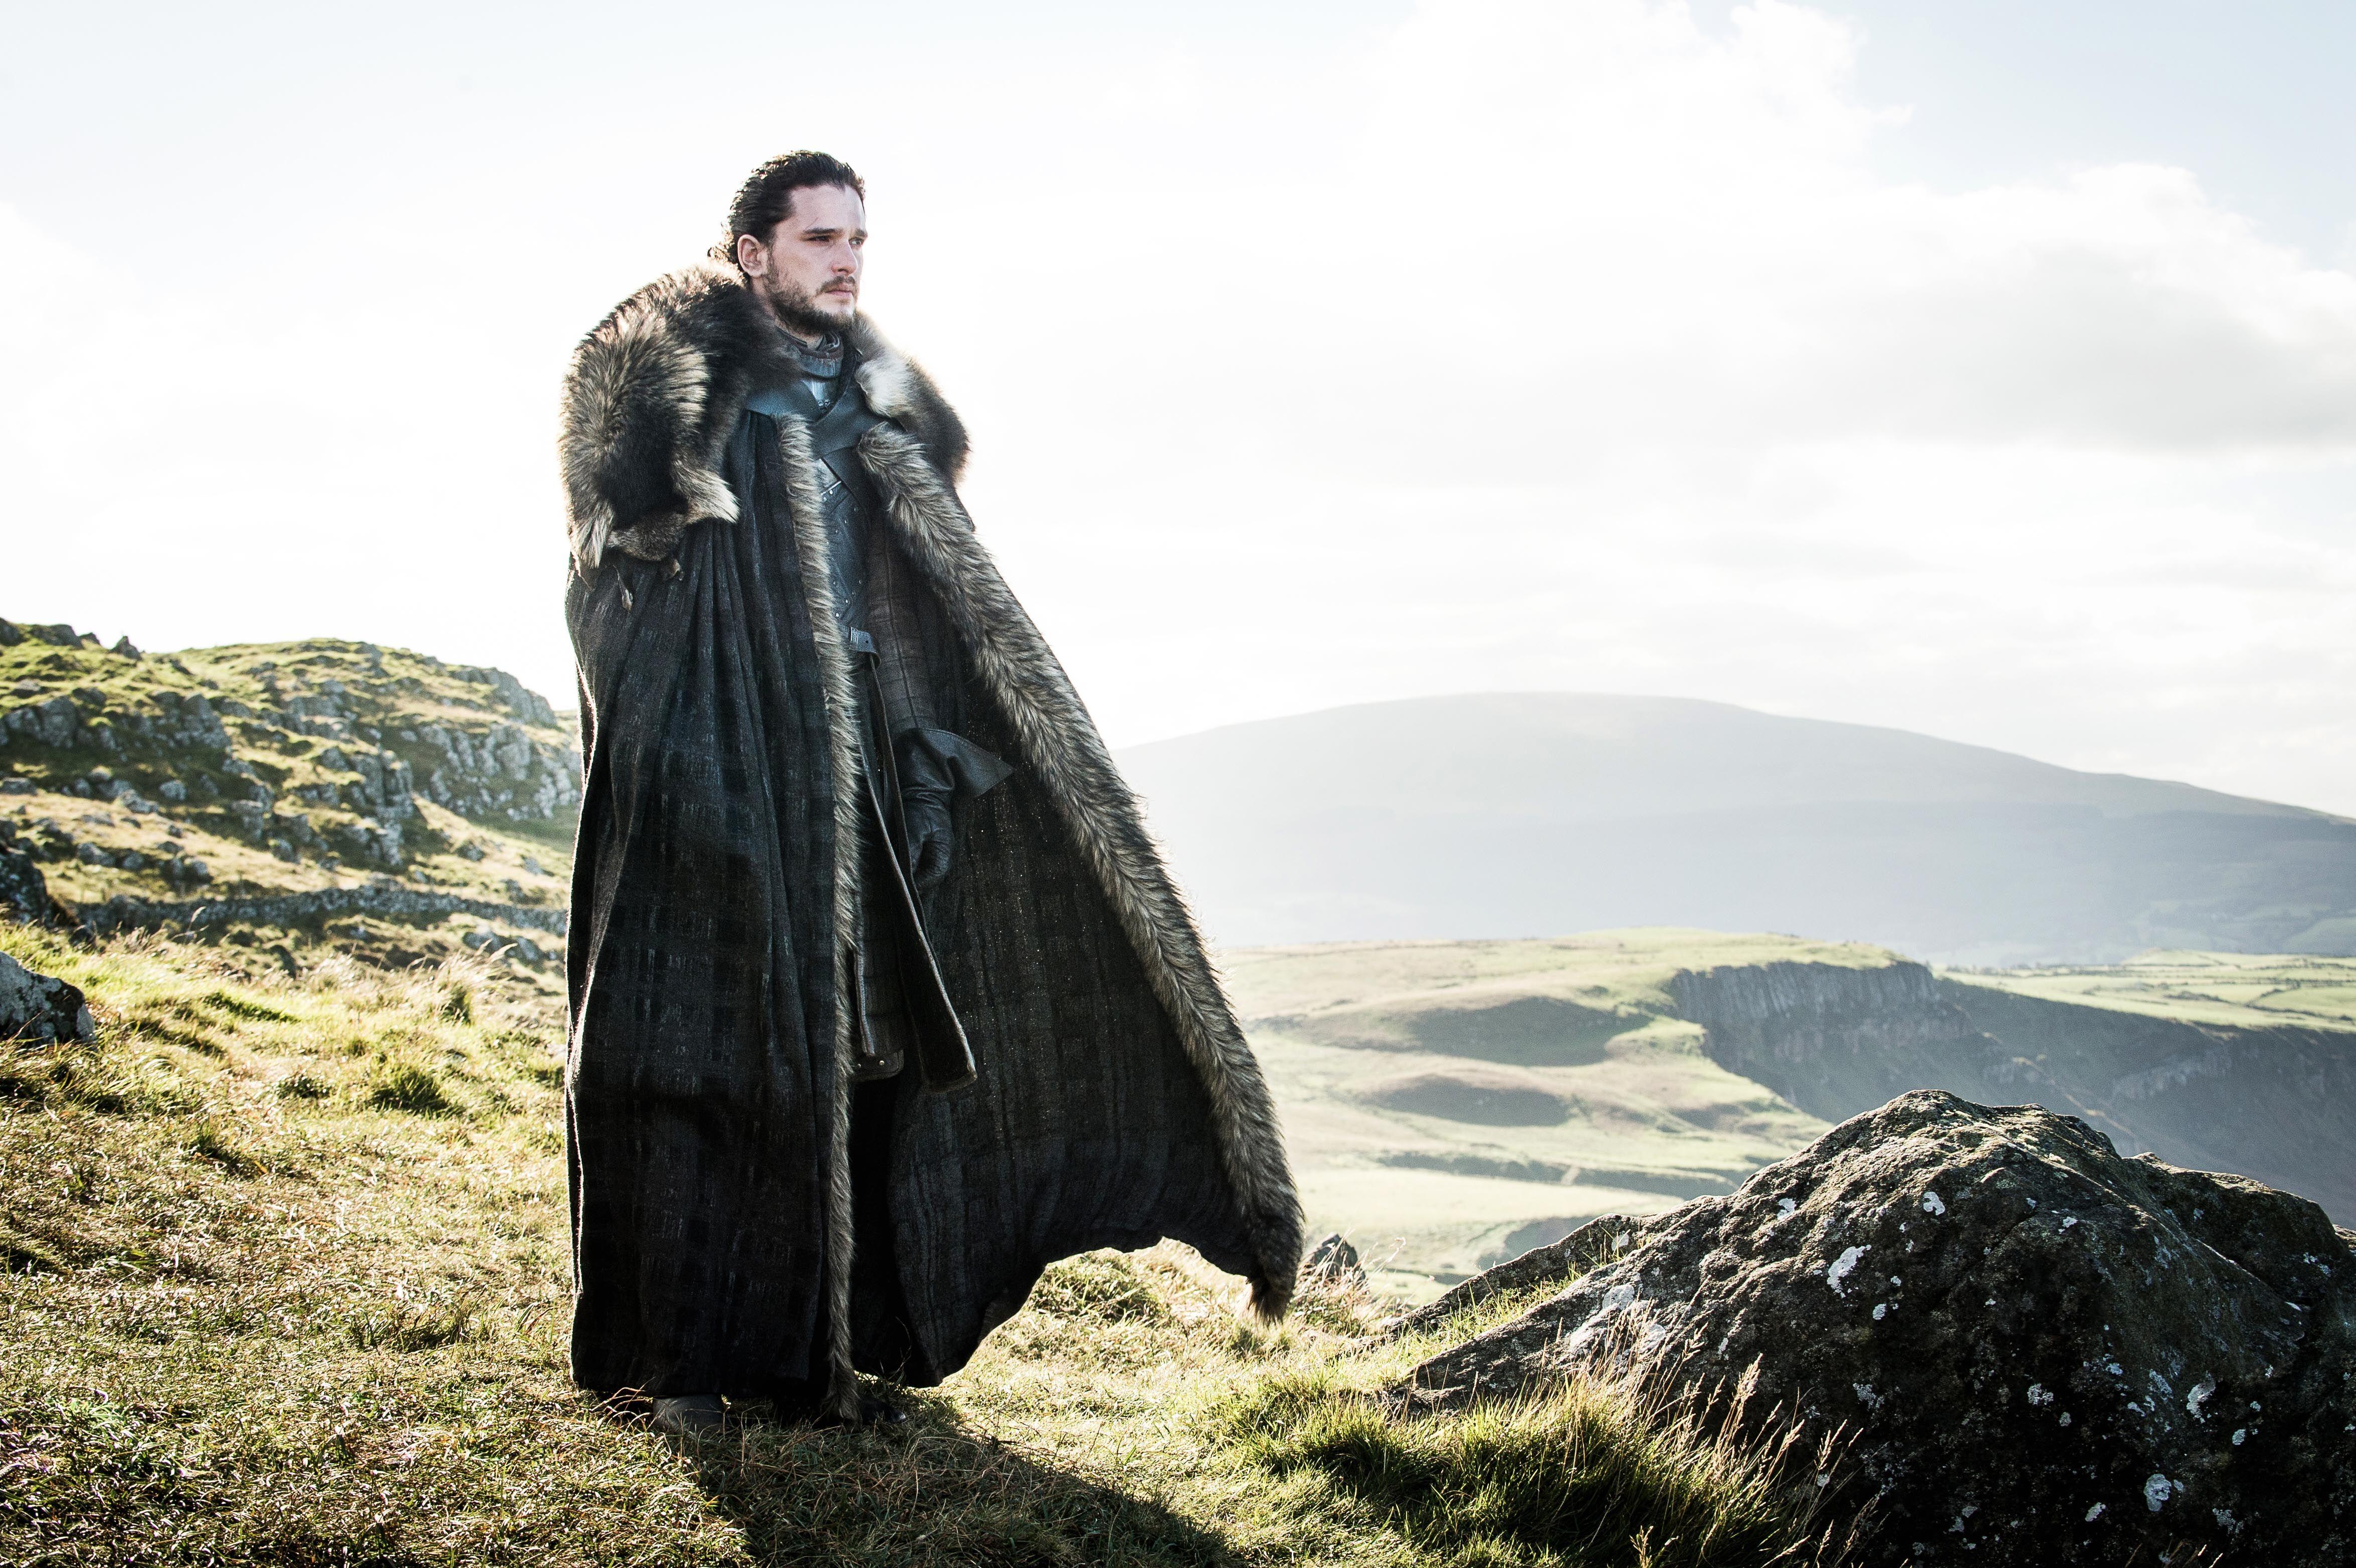 The Northern Fool Fallacy Jon Snow S Motivations In Season 7